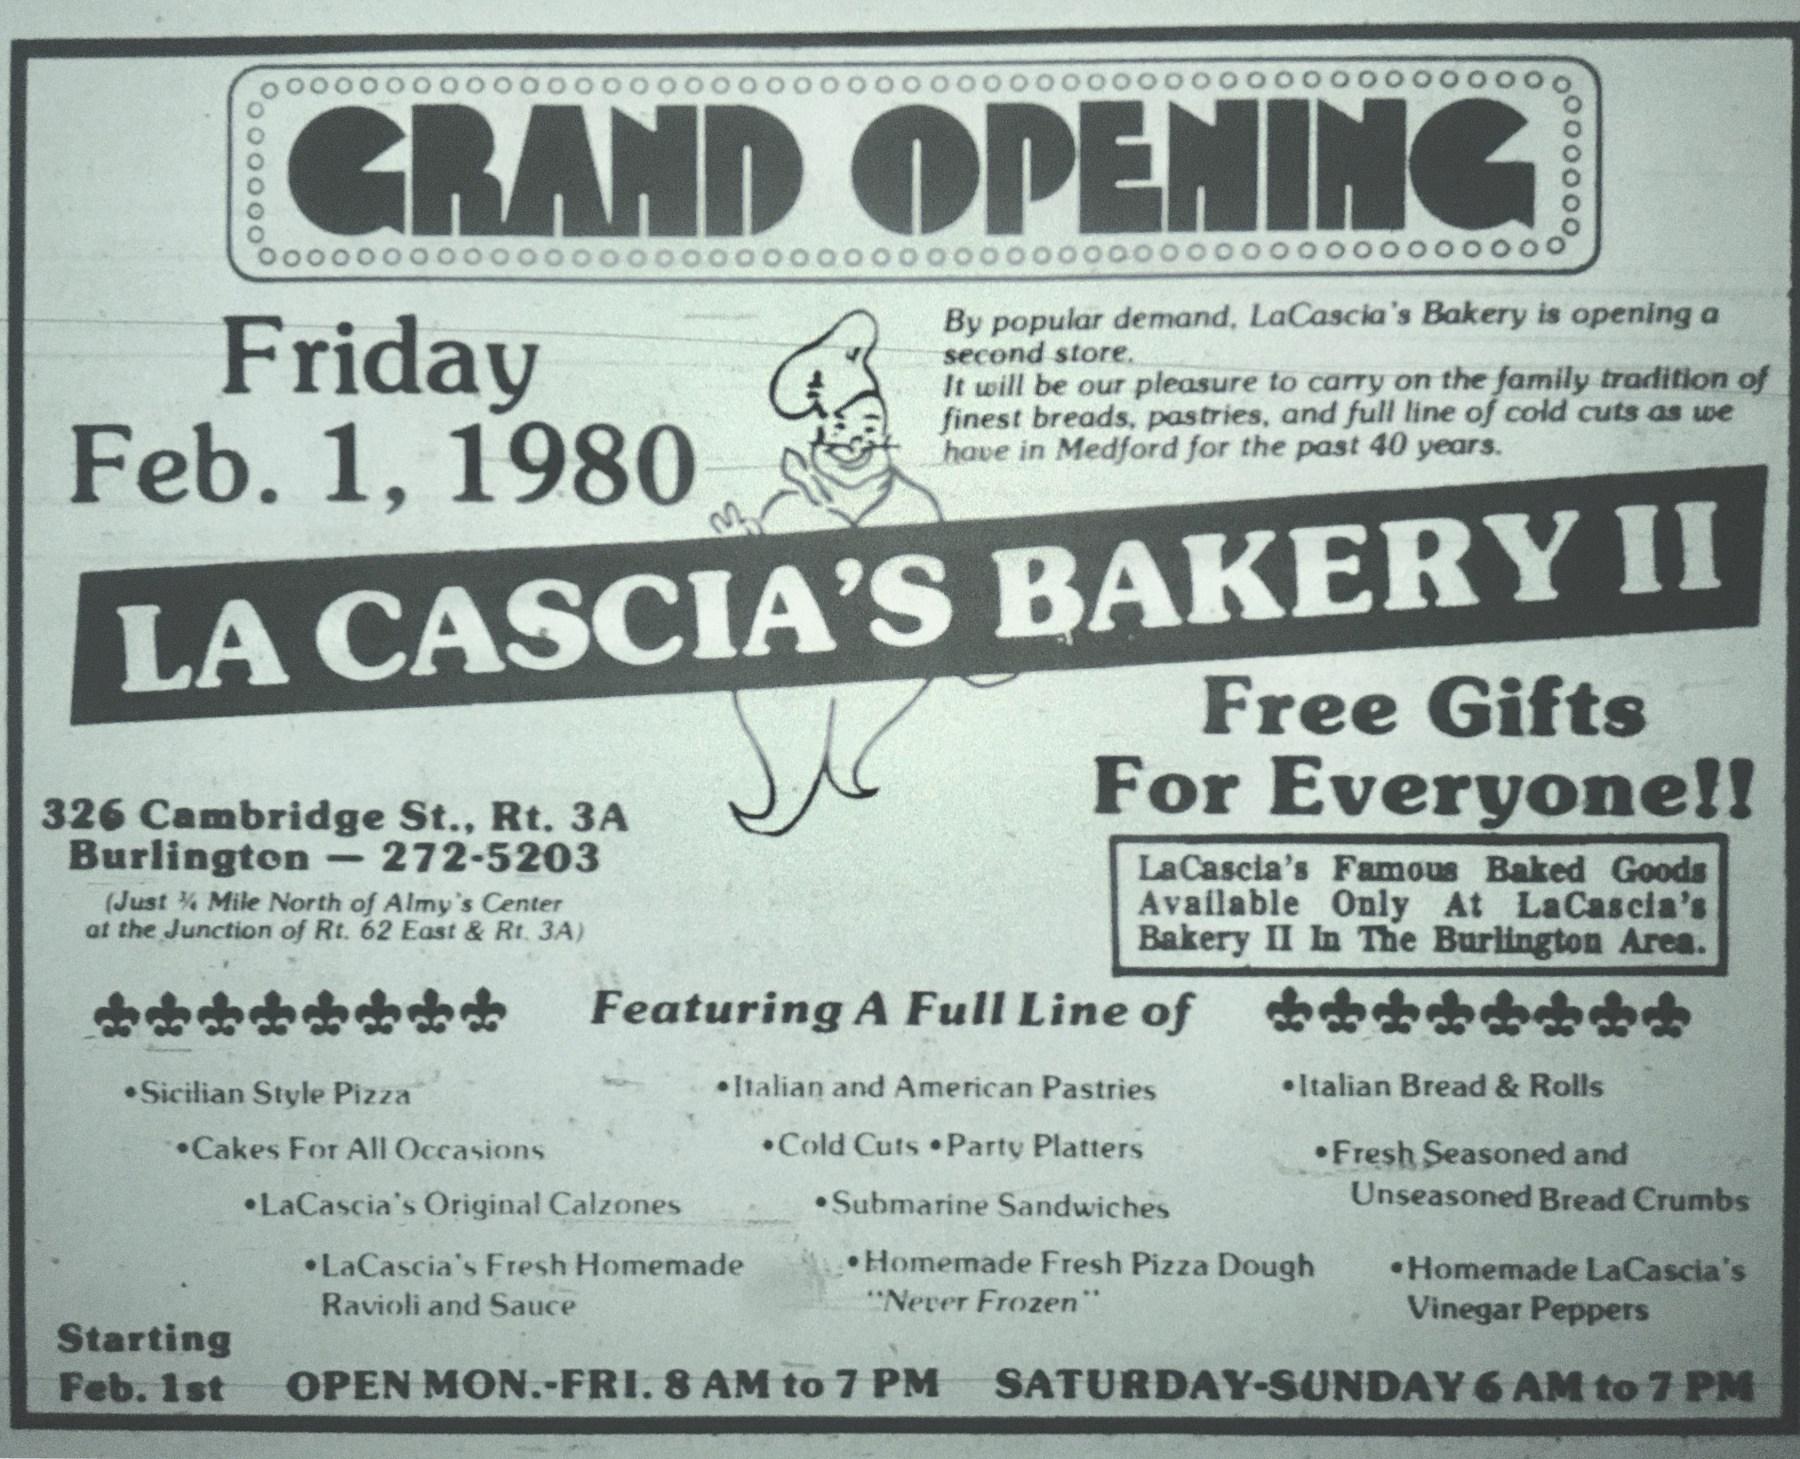 La Cascia's Bakery II, Burlington MA